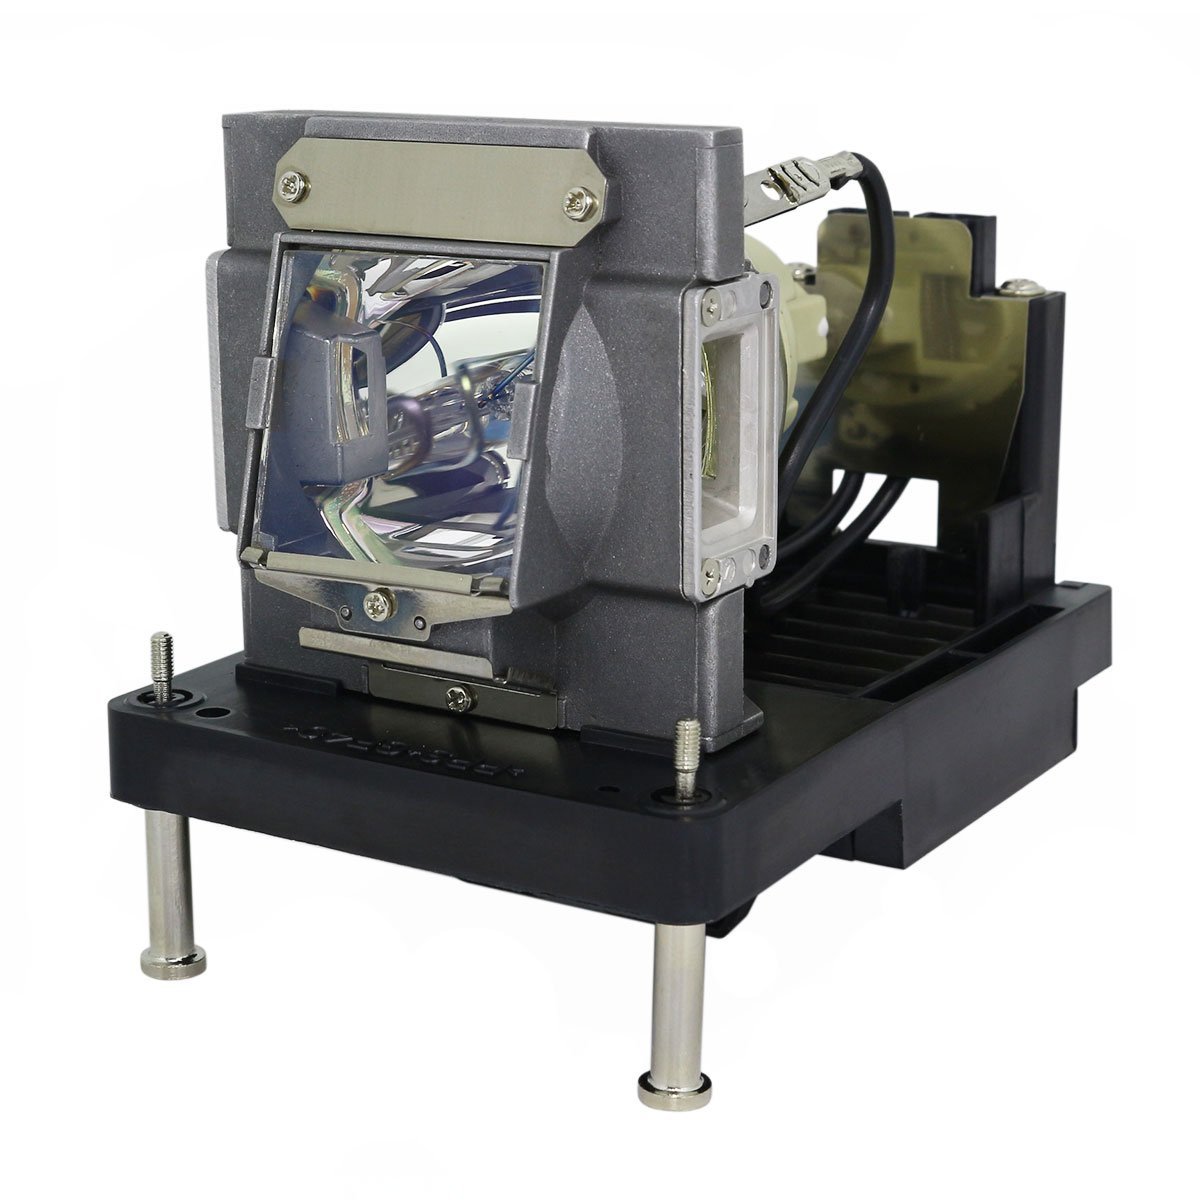 SpArc OEM 交換用ランプ 囲い/バルブ付き Vivitek 3797772800-SVK Platinum (Brighter/Durable) Platinum (Brighter/Durable) Lamp with Housing B07MLNTSK5